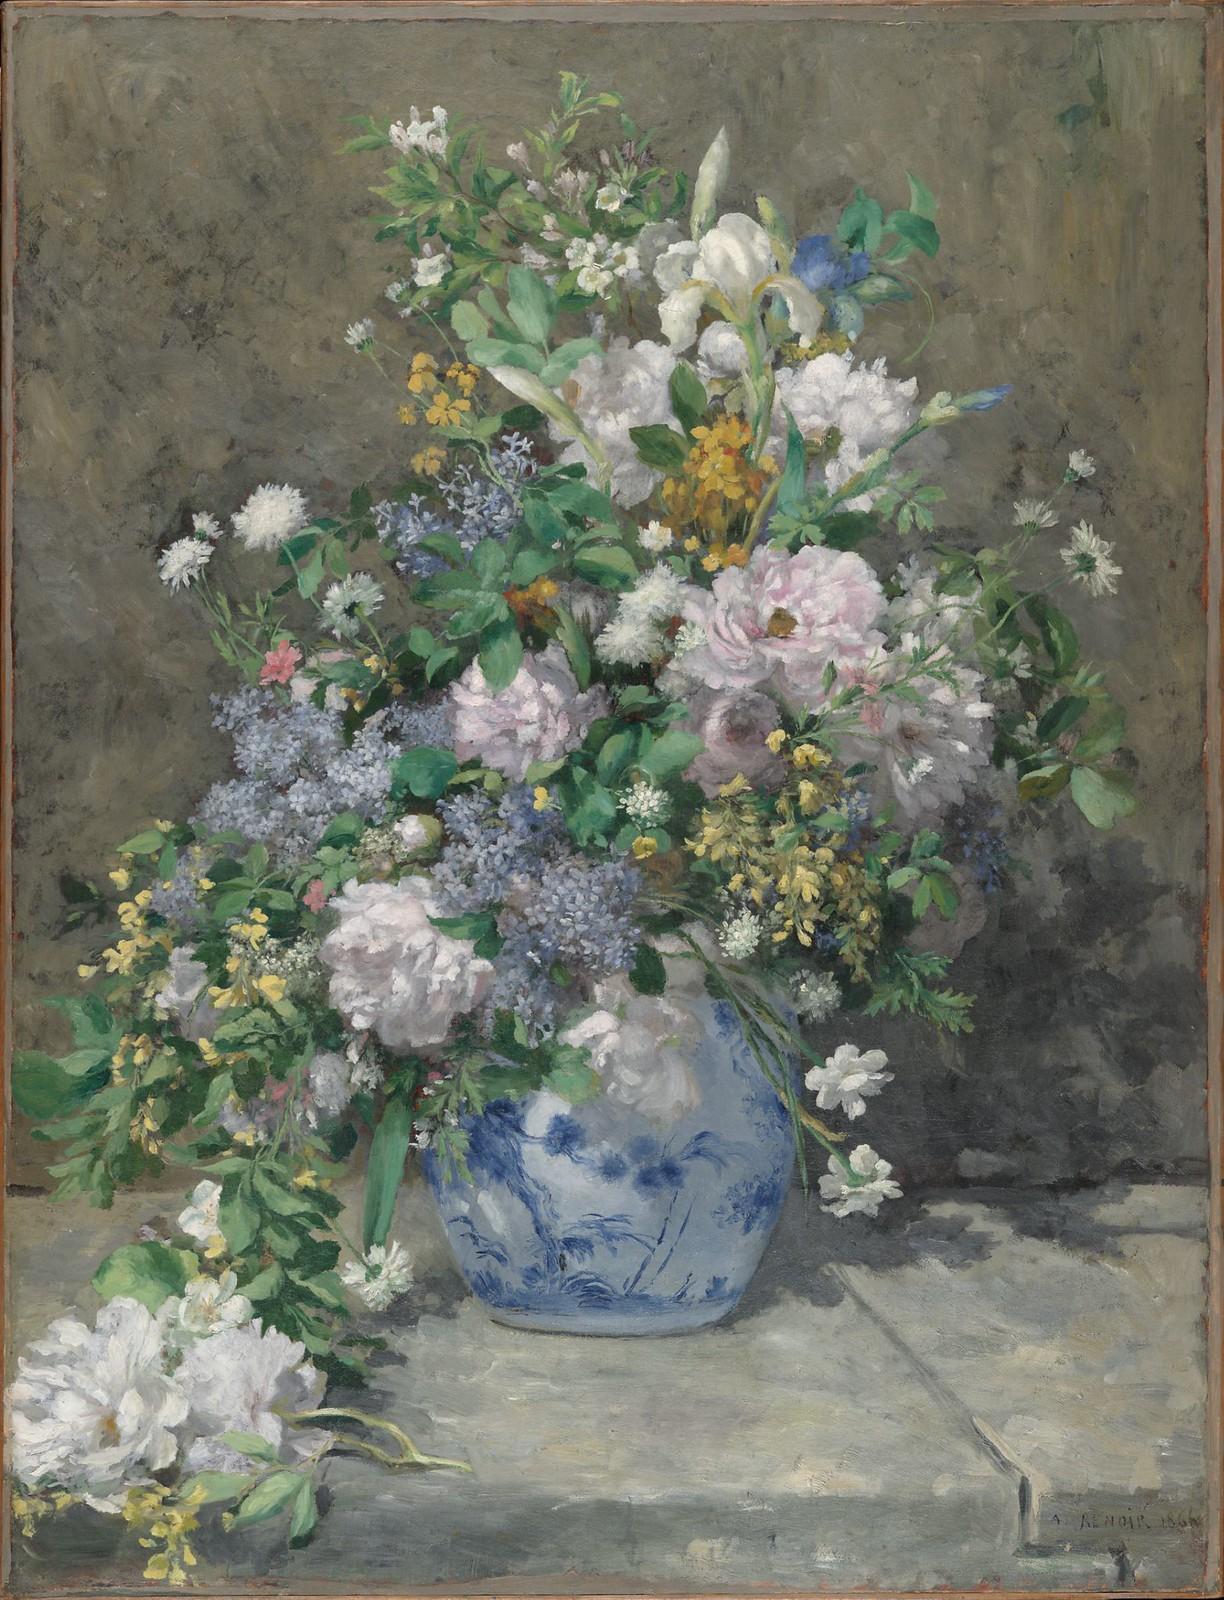 Spring Bouquet by Pierre-Auguste Renoir, 1866